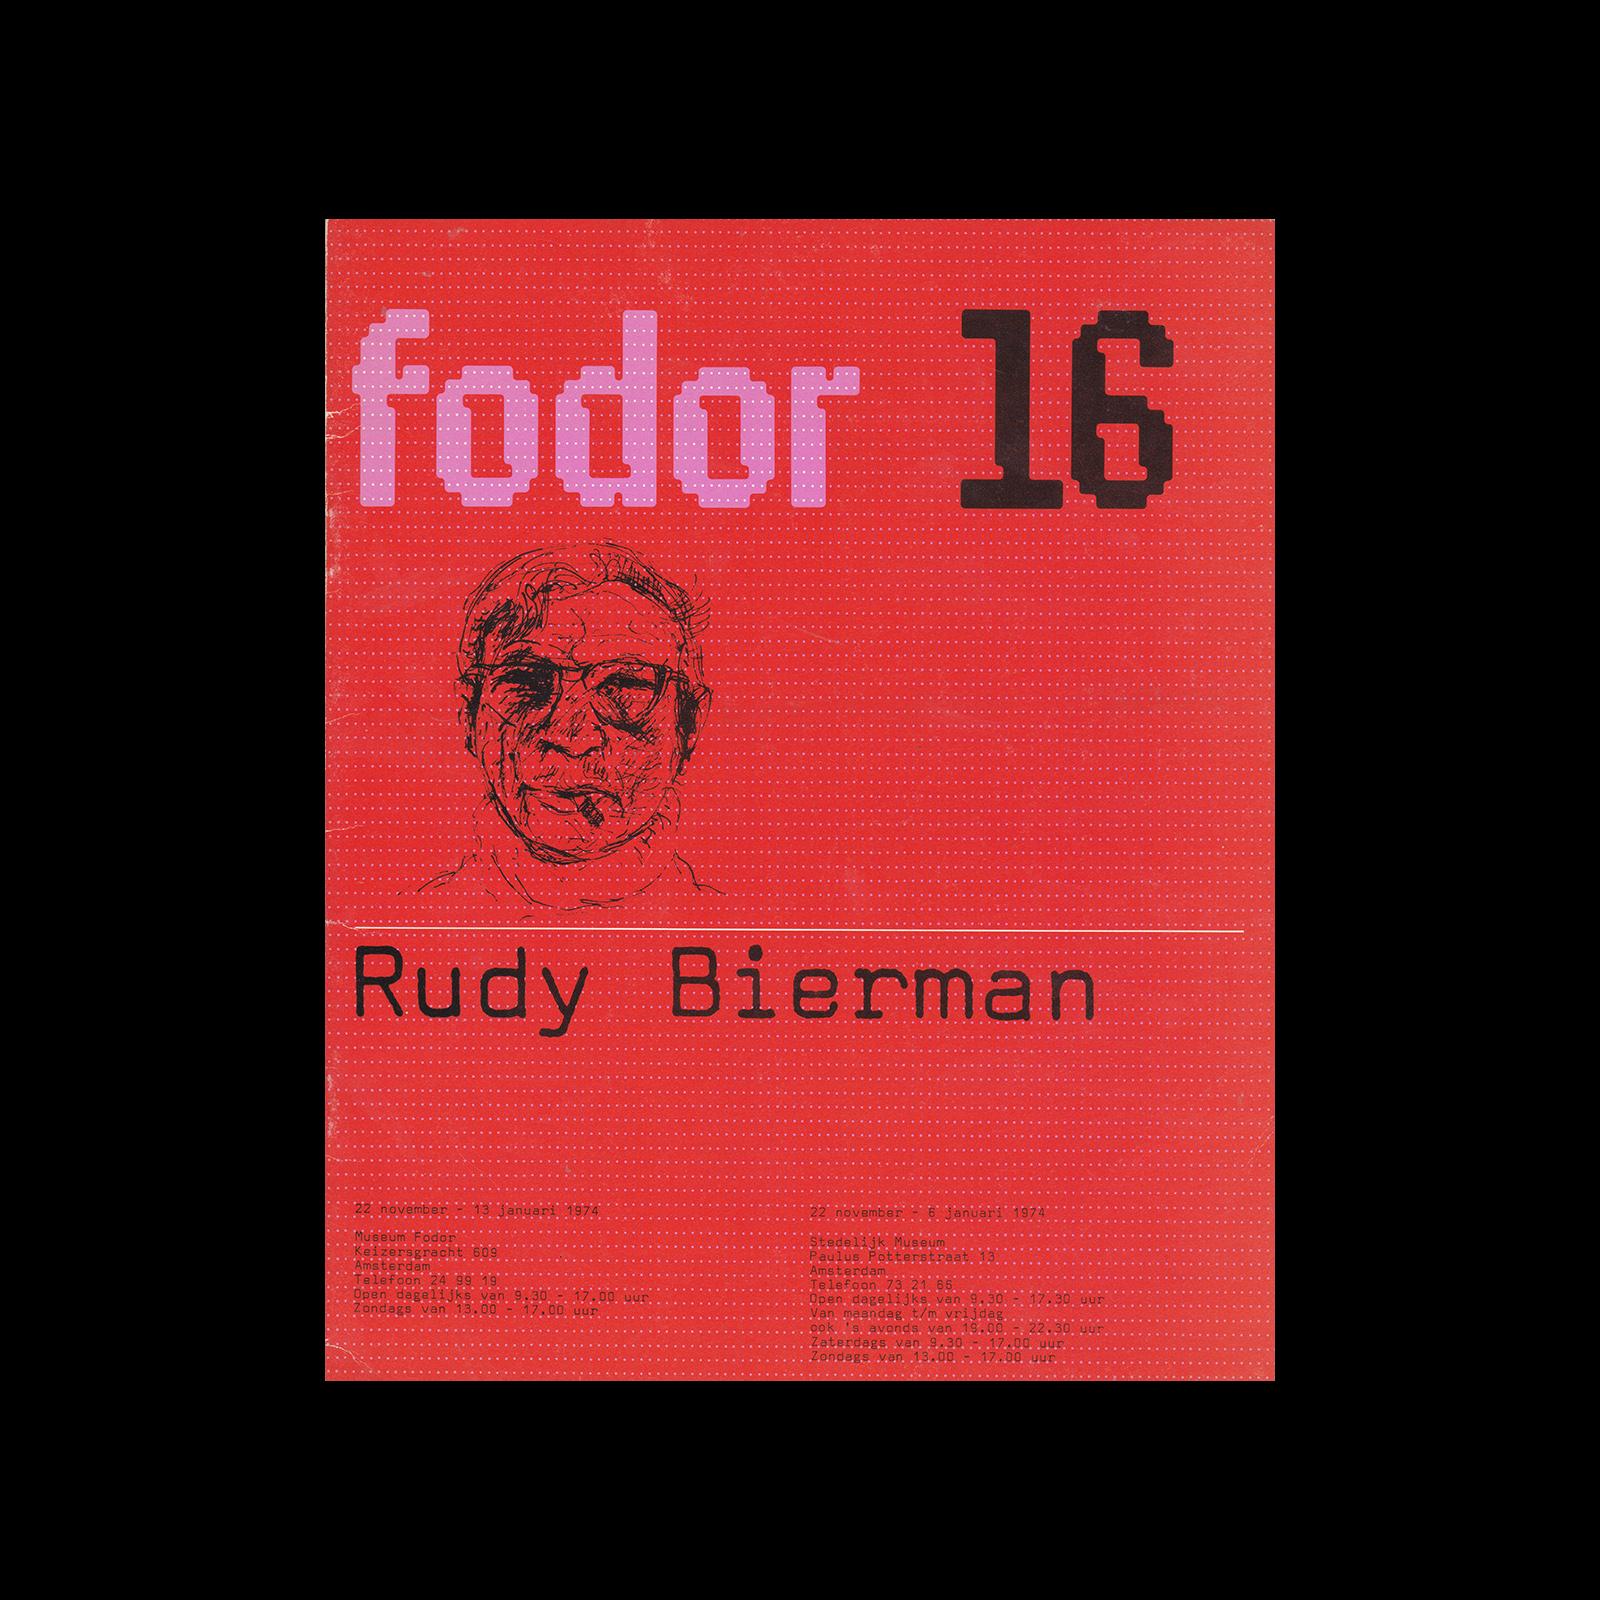 Fodor 16, 1974 - Rudy Bierman. Designed by Wim Crouwel and Daphne Duijvelshoff (Total Design).